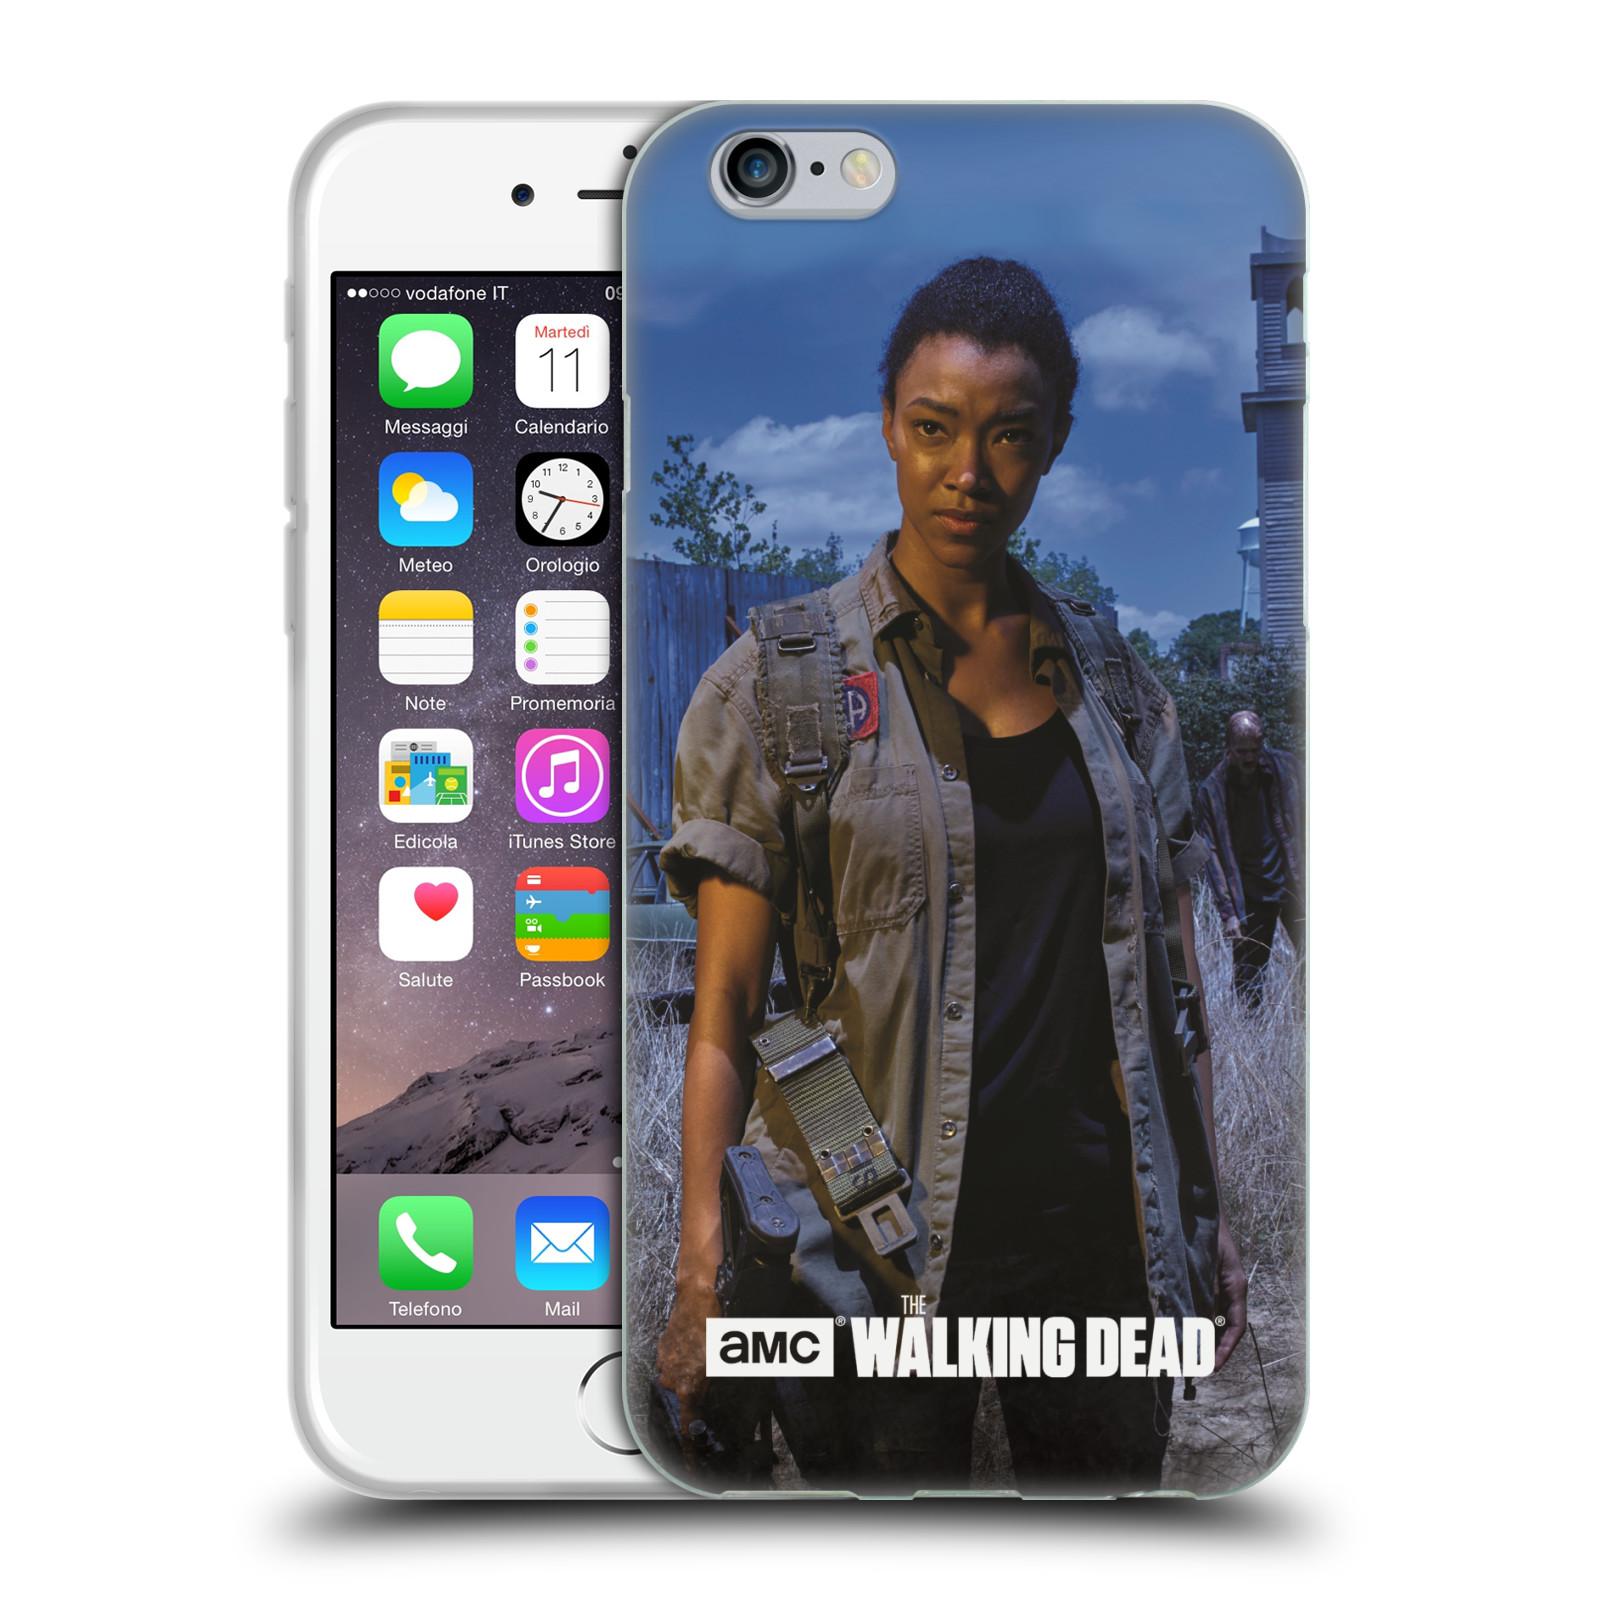 HEAD CASE silikonový obal na mobil Apple Iphone 6 / 6S originální potisk Walking Dead postavy v akci Sasha